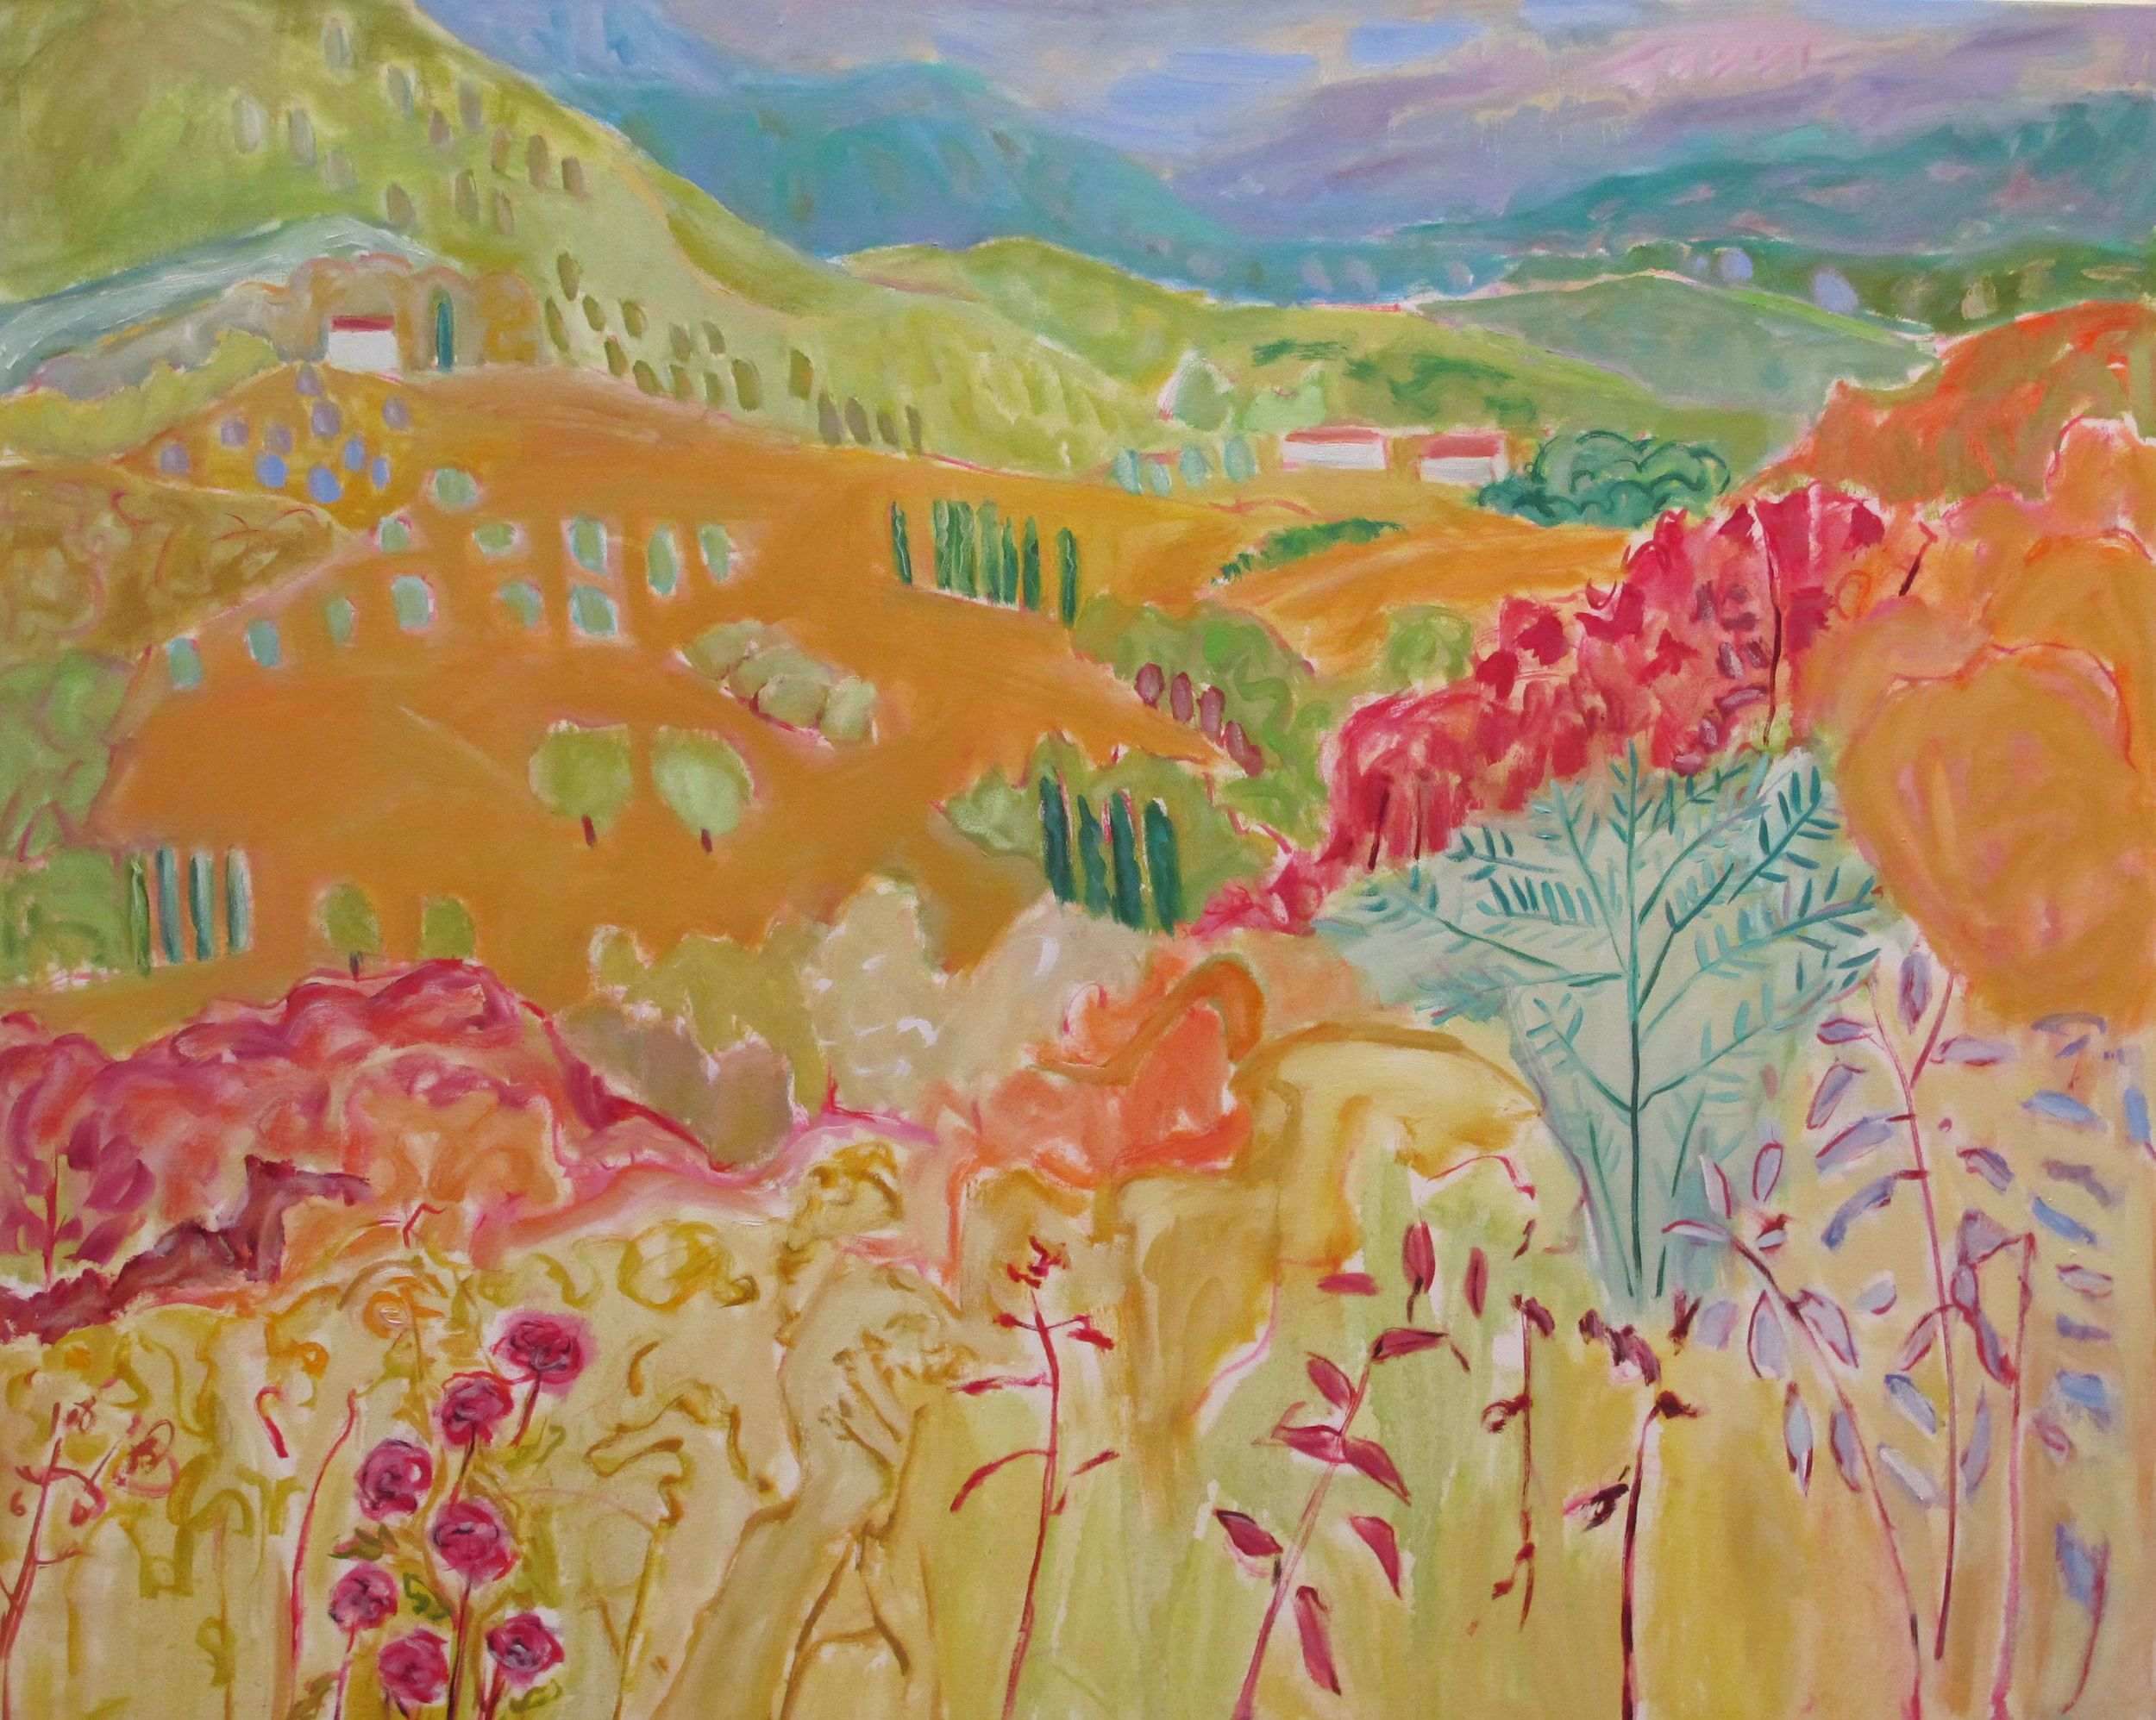 L Near Perugia oil on canvas 48 x 60 inches.jpg